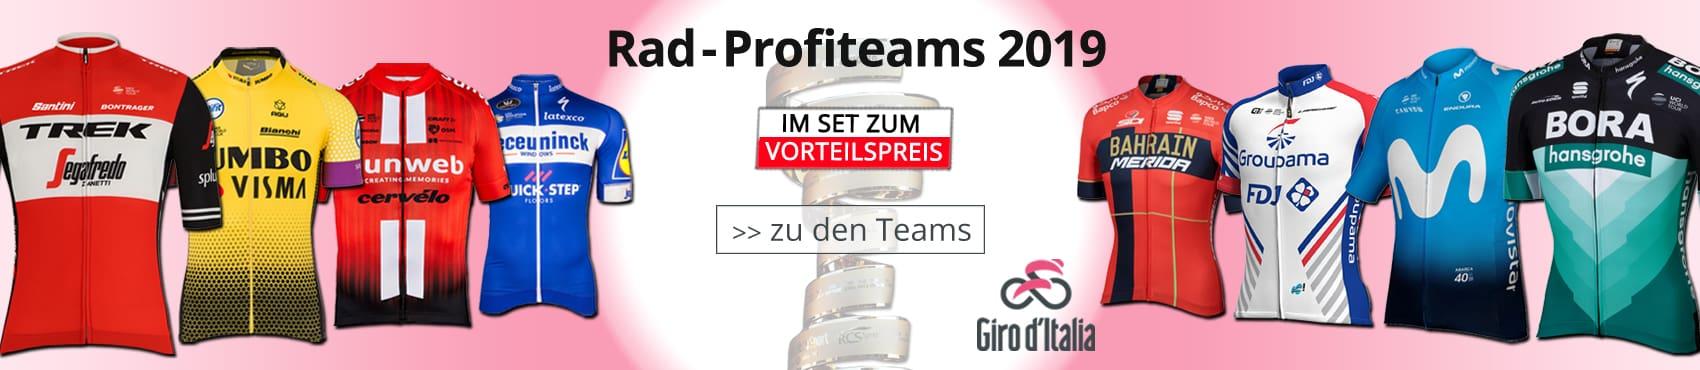 Rad-Profiteams 2019